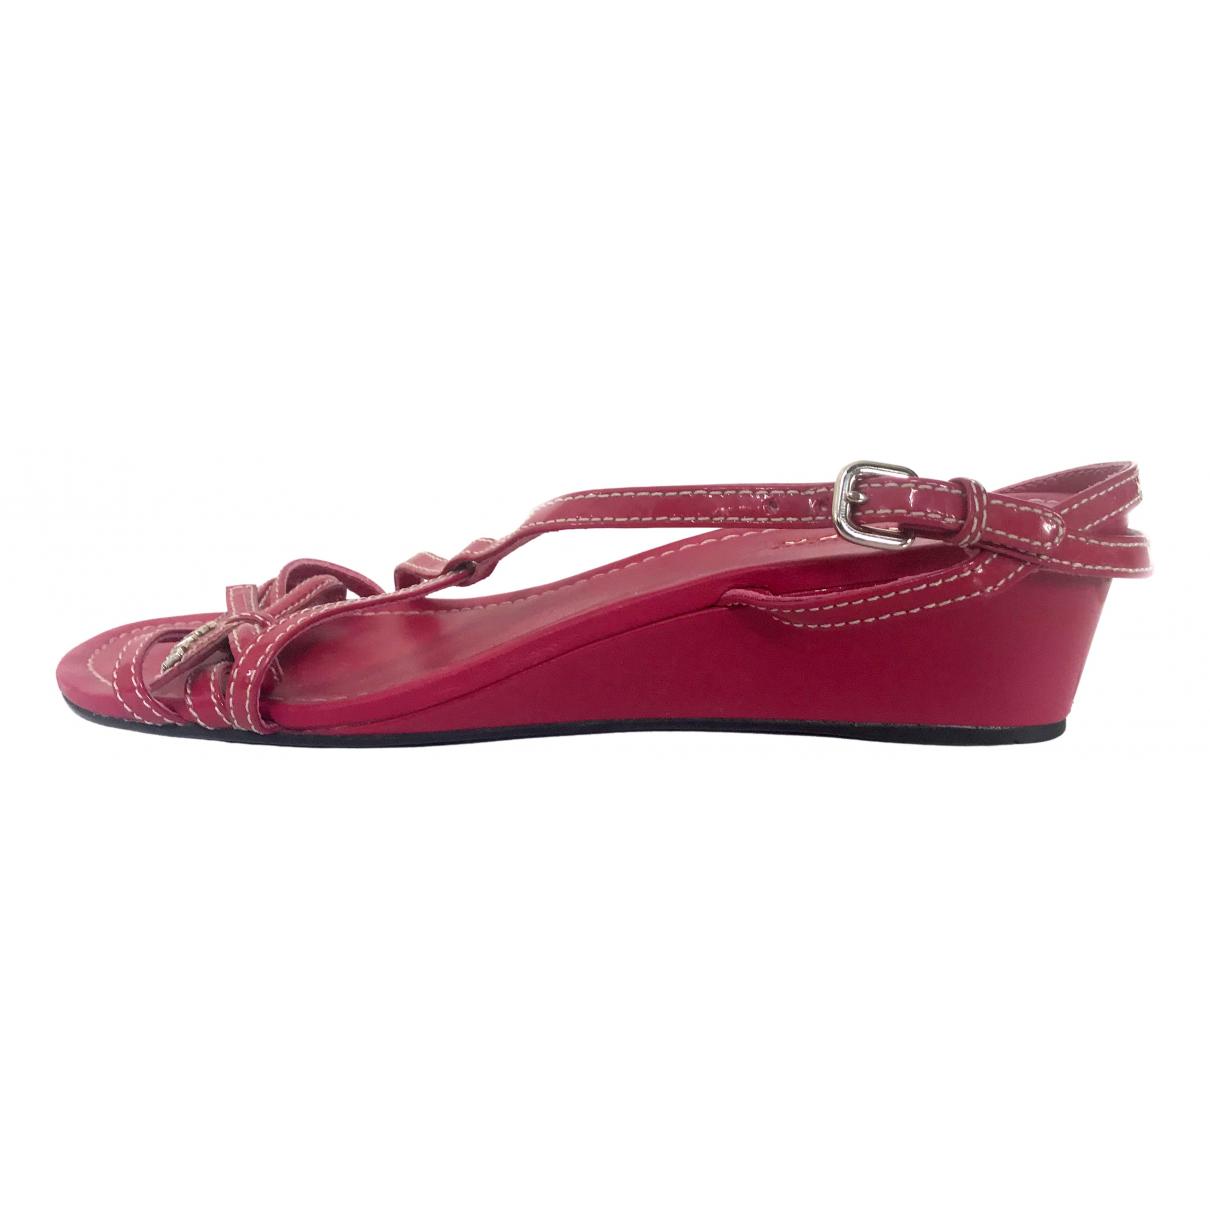 Prada \N Pink Patent leather Sandals for Women 38.5 EU